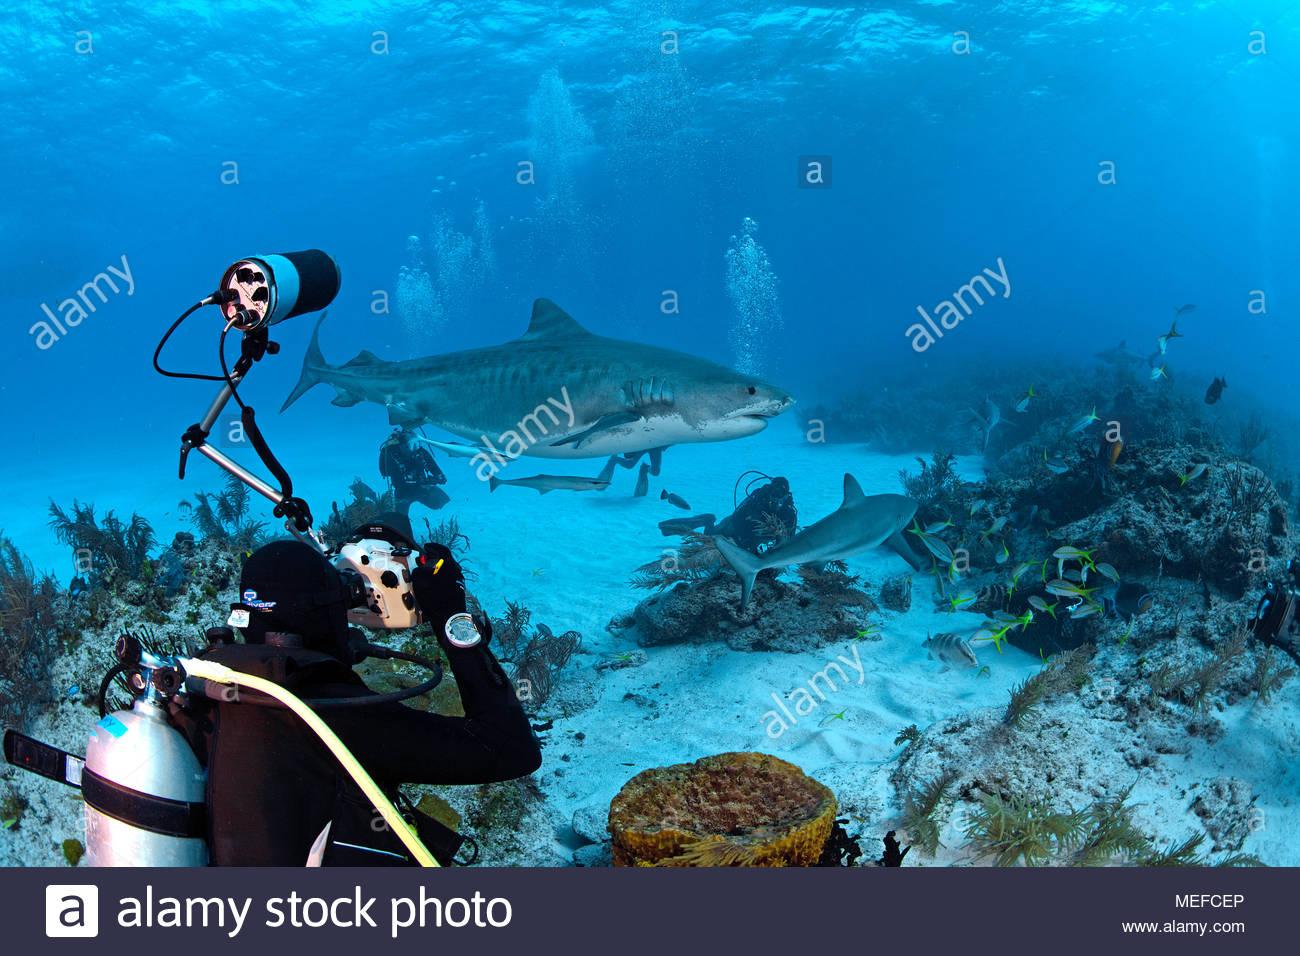 Taucher fotografiert Tigerhai (Galeocerdo cuvier), Bahamas | Scuba diver photographing a Tiger shark (Galeocerdo cuvier), Bahama Banks, Bahamas - Stock Image